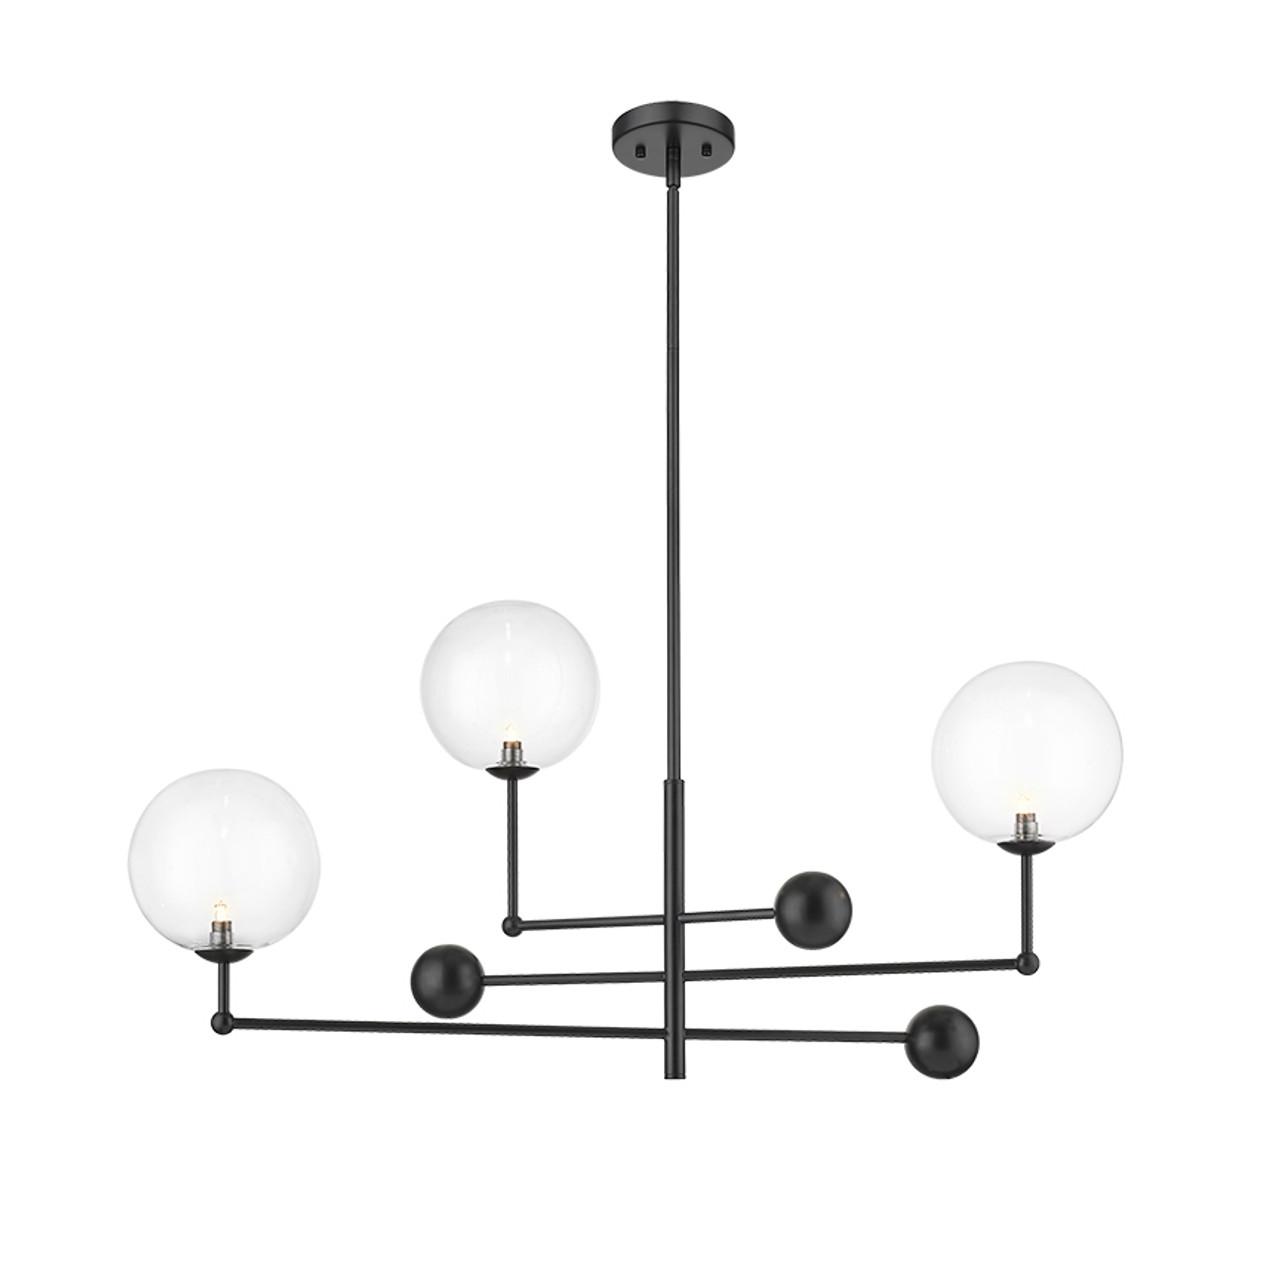 new york 3 light black modern adjustable pendant by mirage lighting